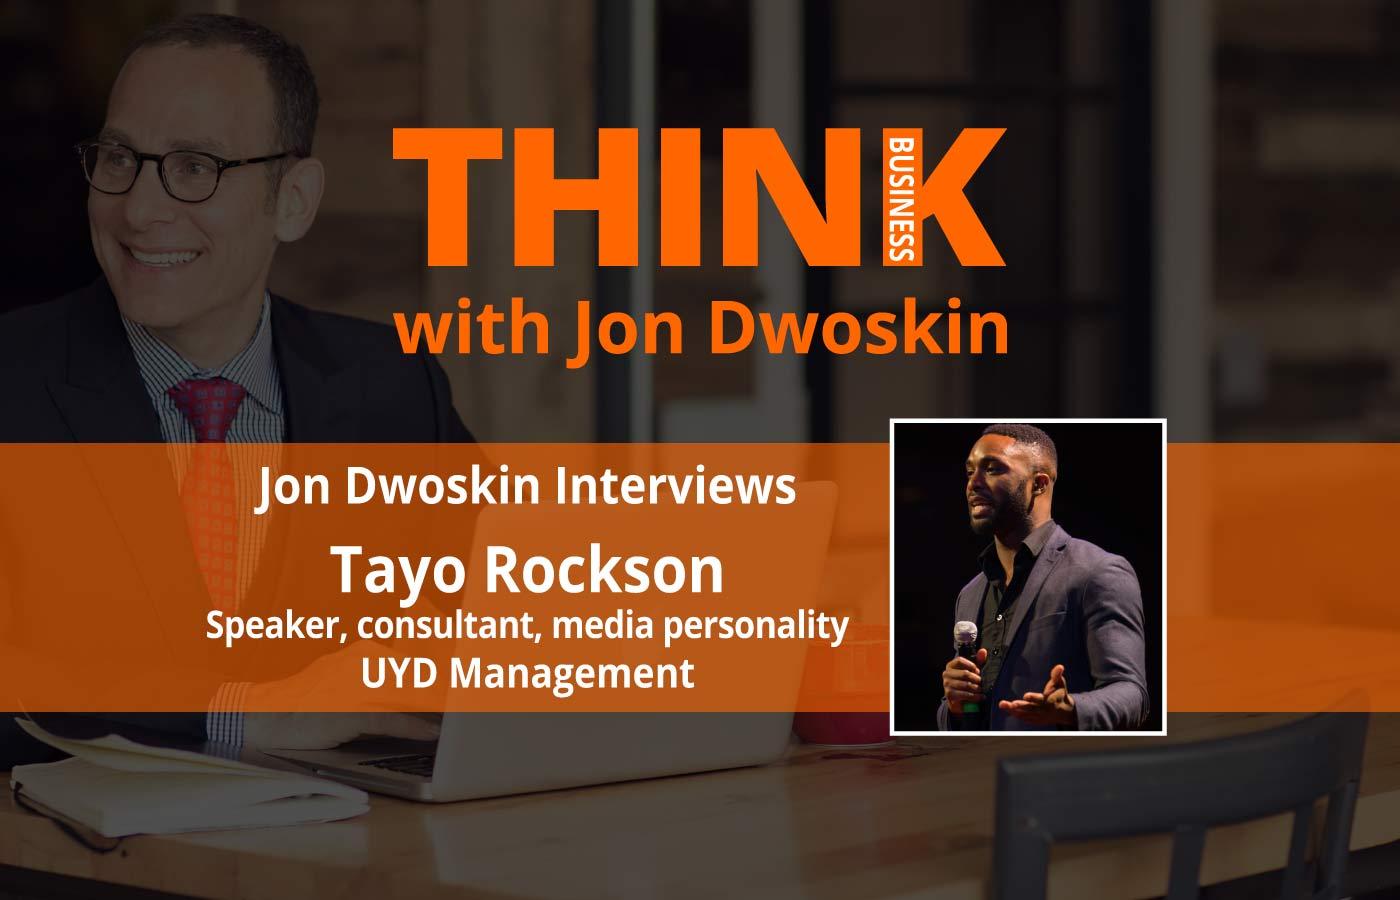 THINK Business Podcast: Jon Dwoskin Interviews Tayo Rockson